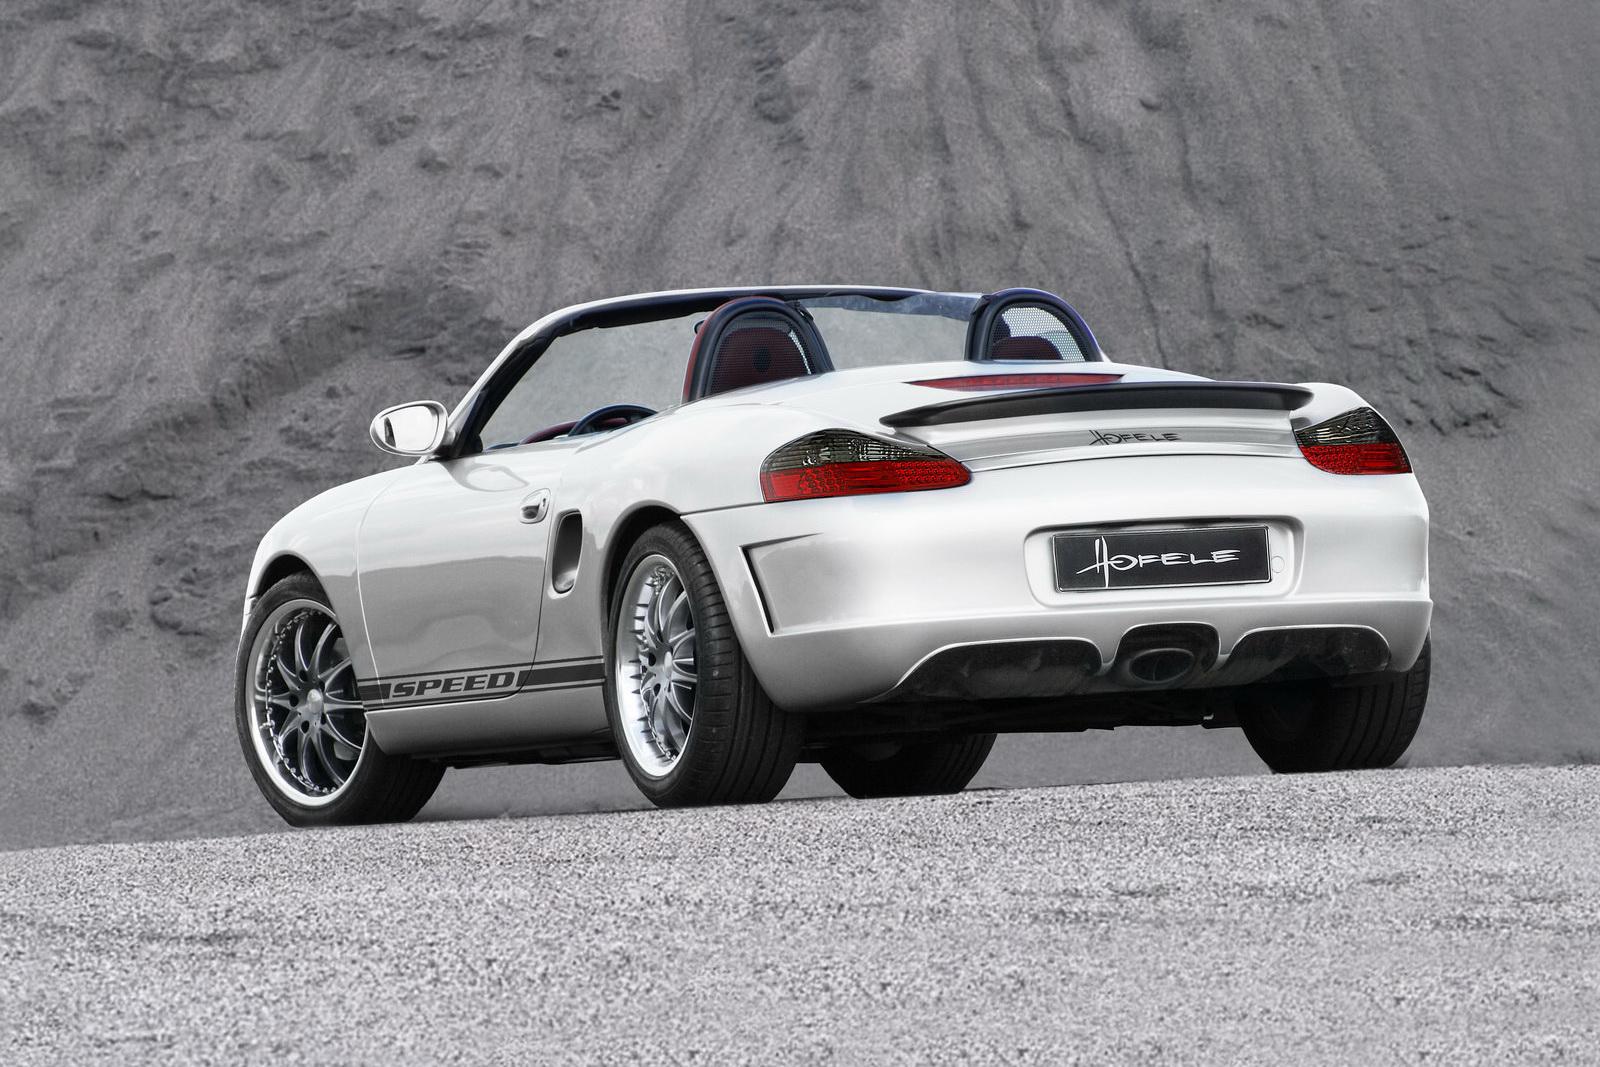 Hofele Design Targets The First Generation Porsche Boxster